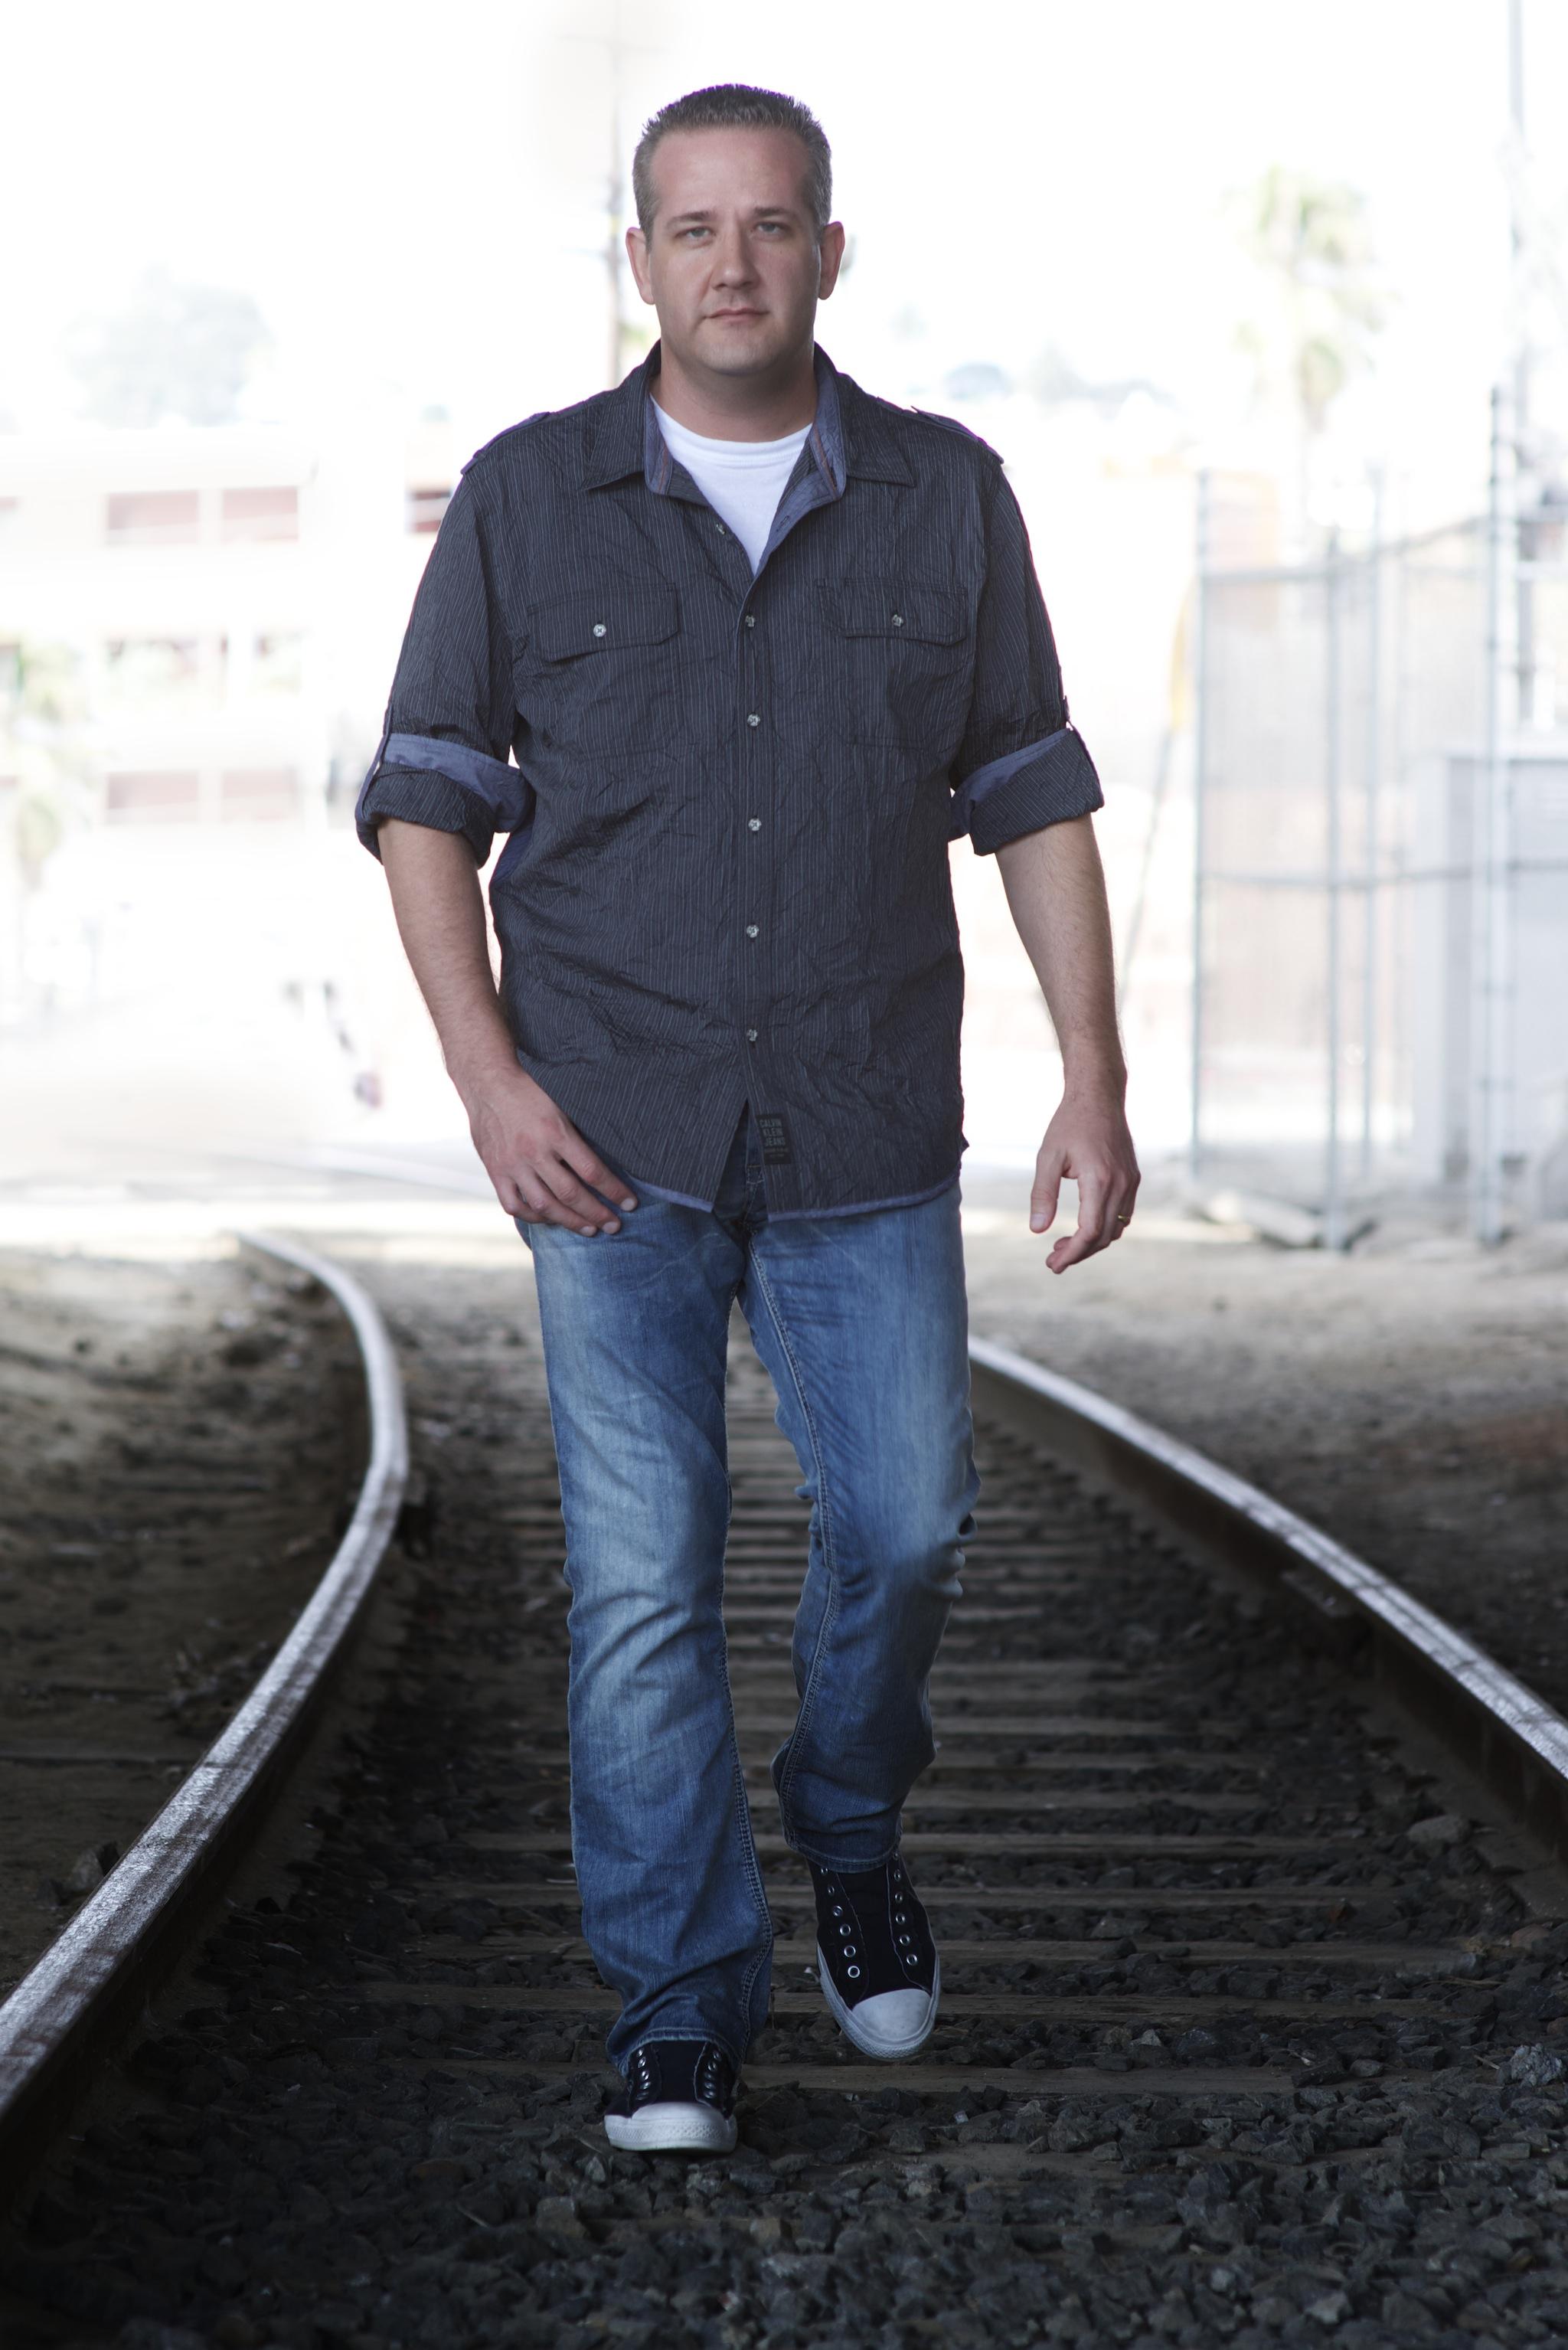 Chris Duke (2012) Downtown San Diego